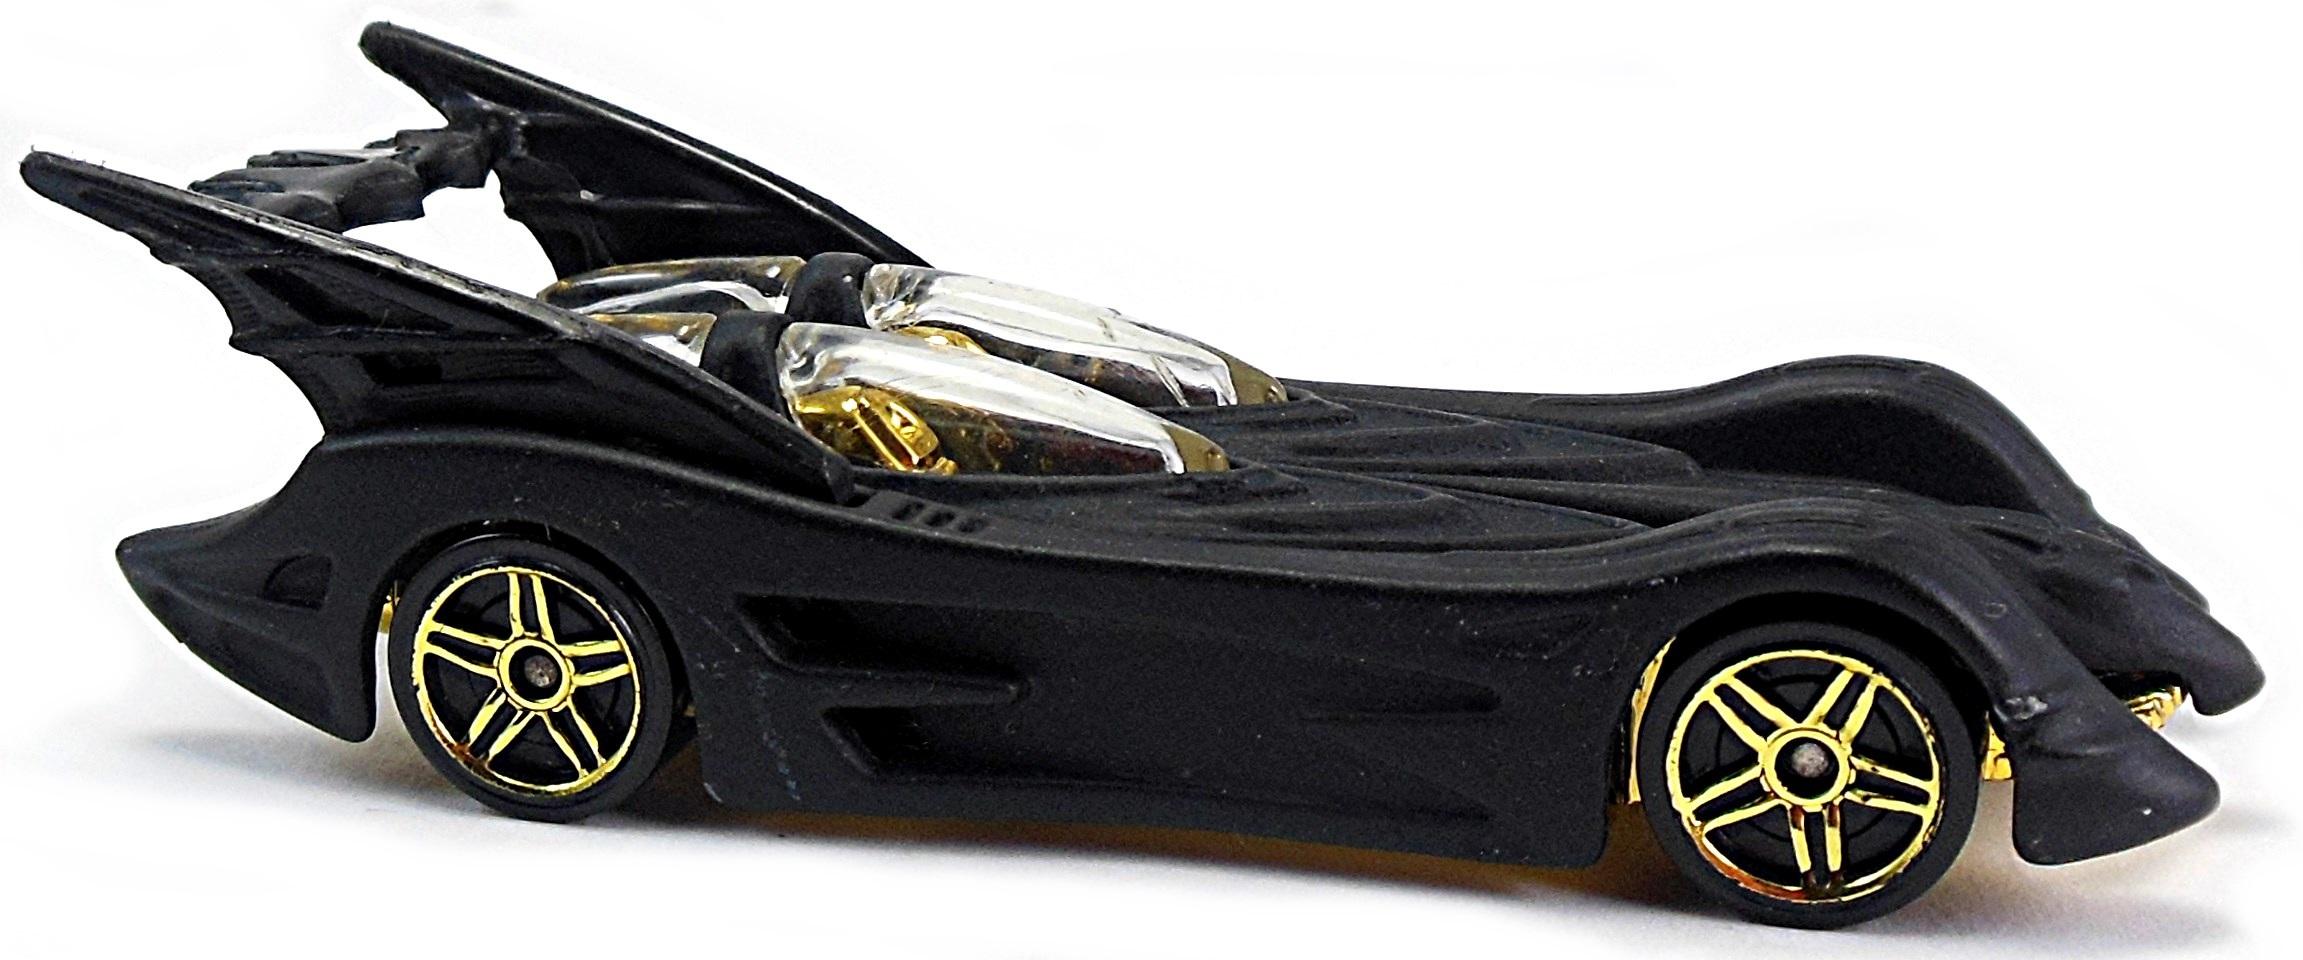 Batmobile Affinity (s03) - 83mm - 2004